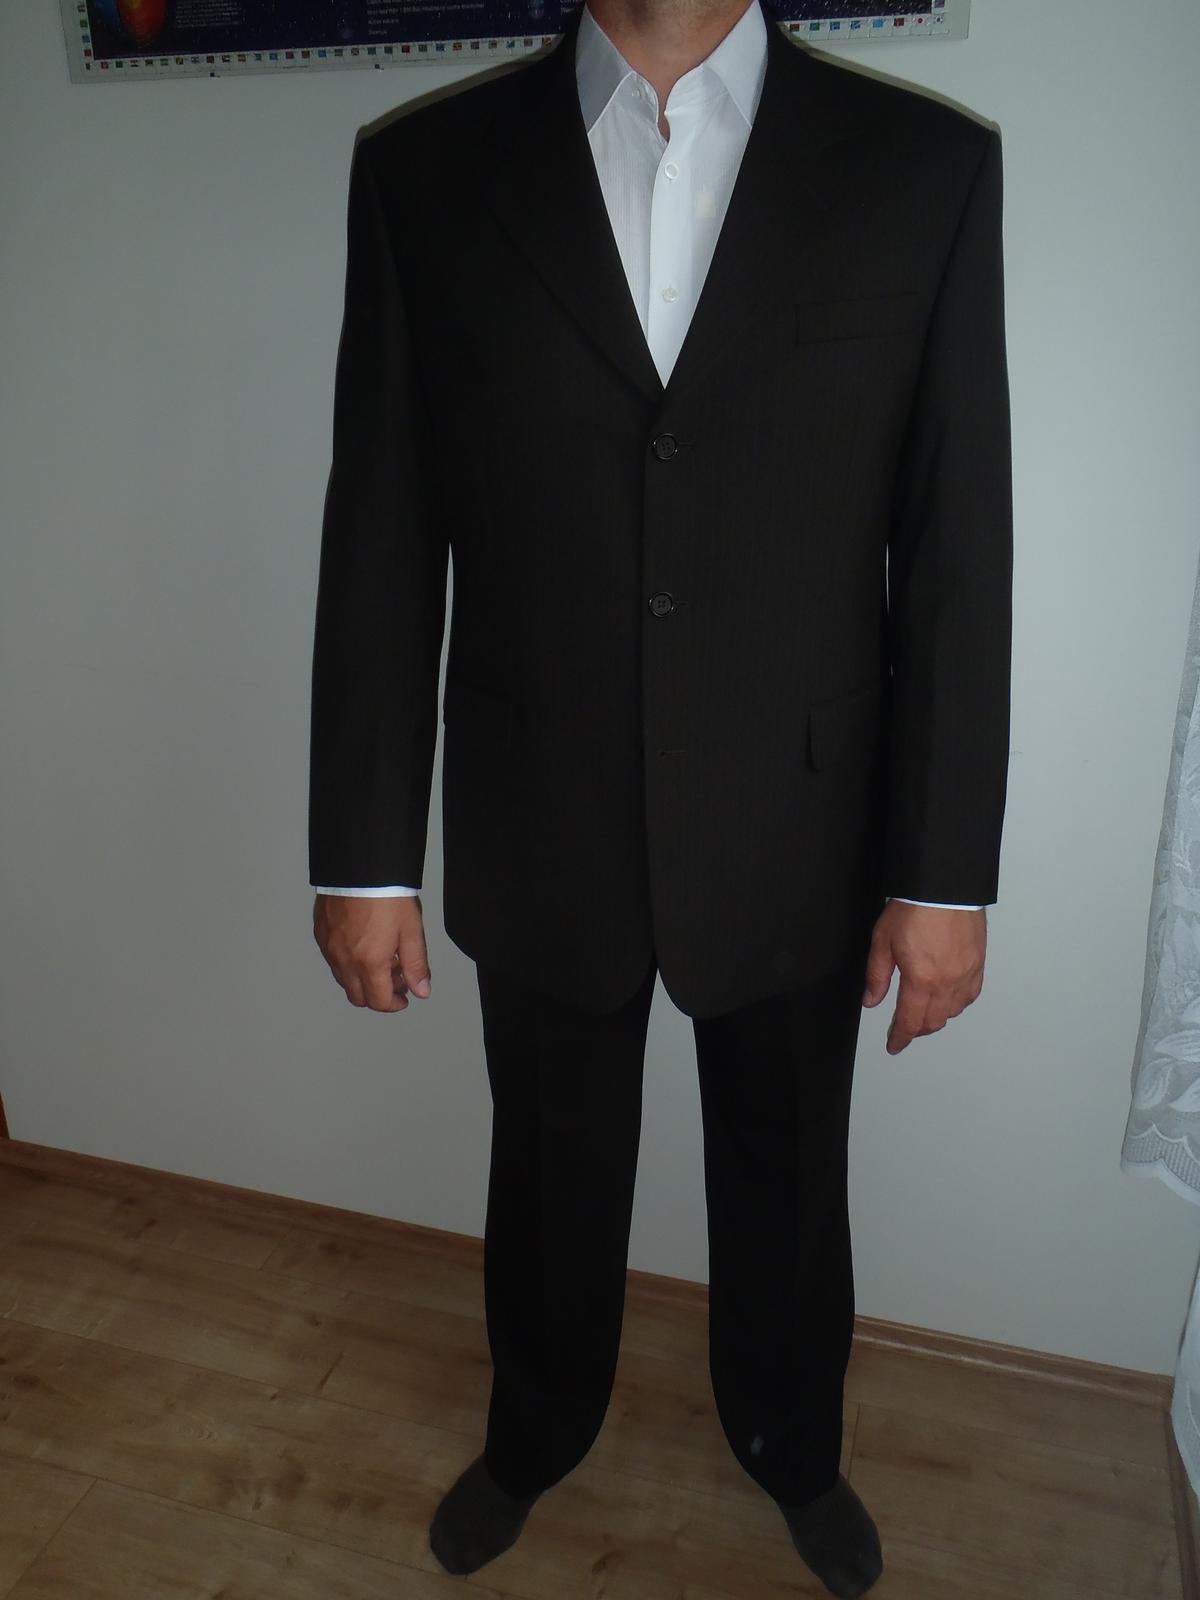 Hnedý oblek - Obrázok č. 1